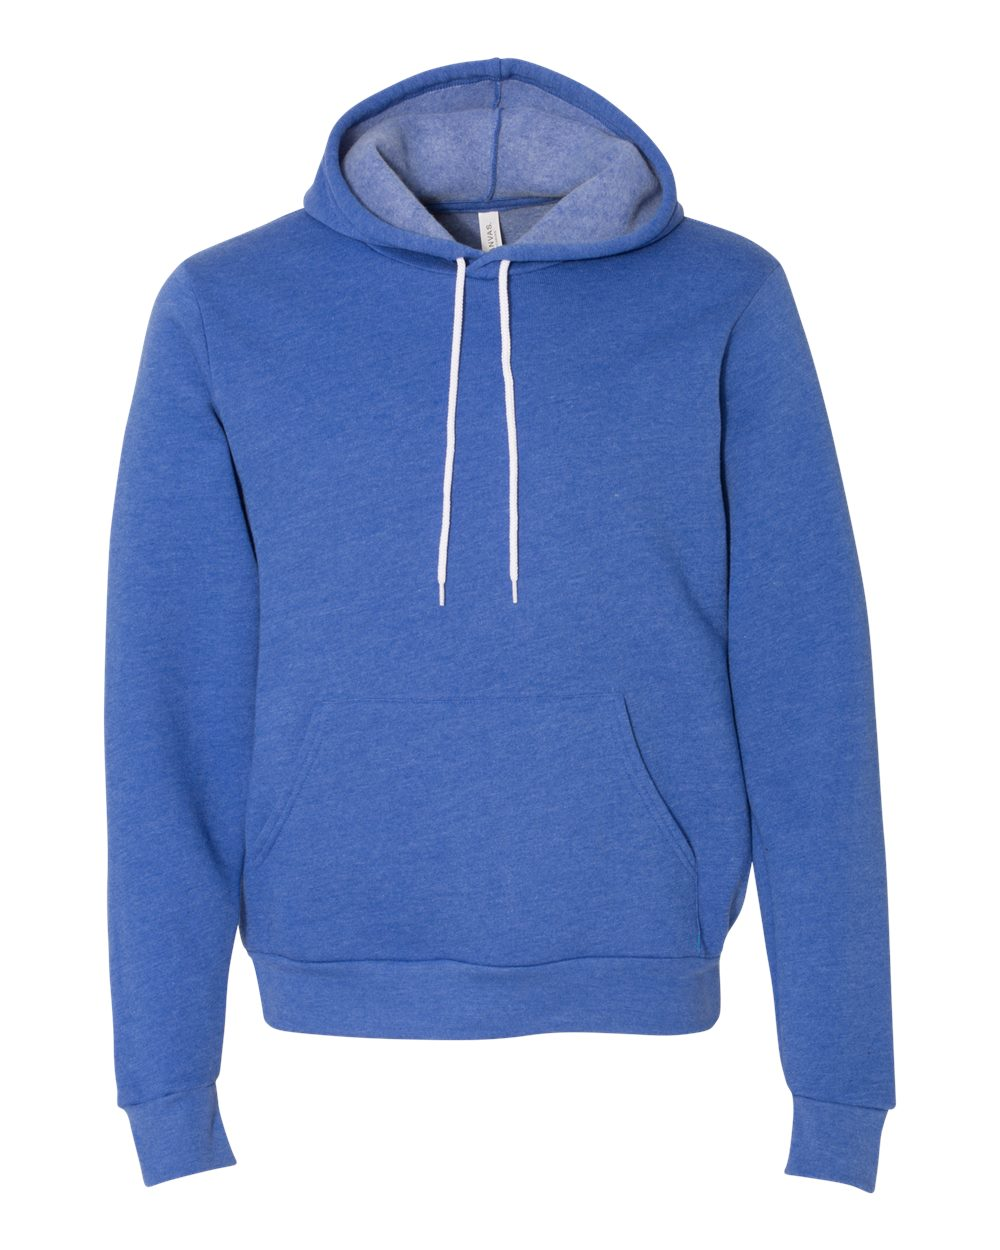 Bella-Canvas-Unisex-Sponge-Hooded-Pullover-Sweatshirt-Blank-3719-up-to-2XL thumbnail 63